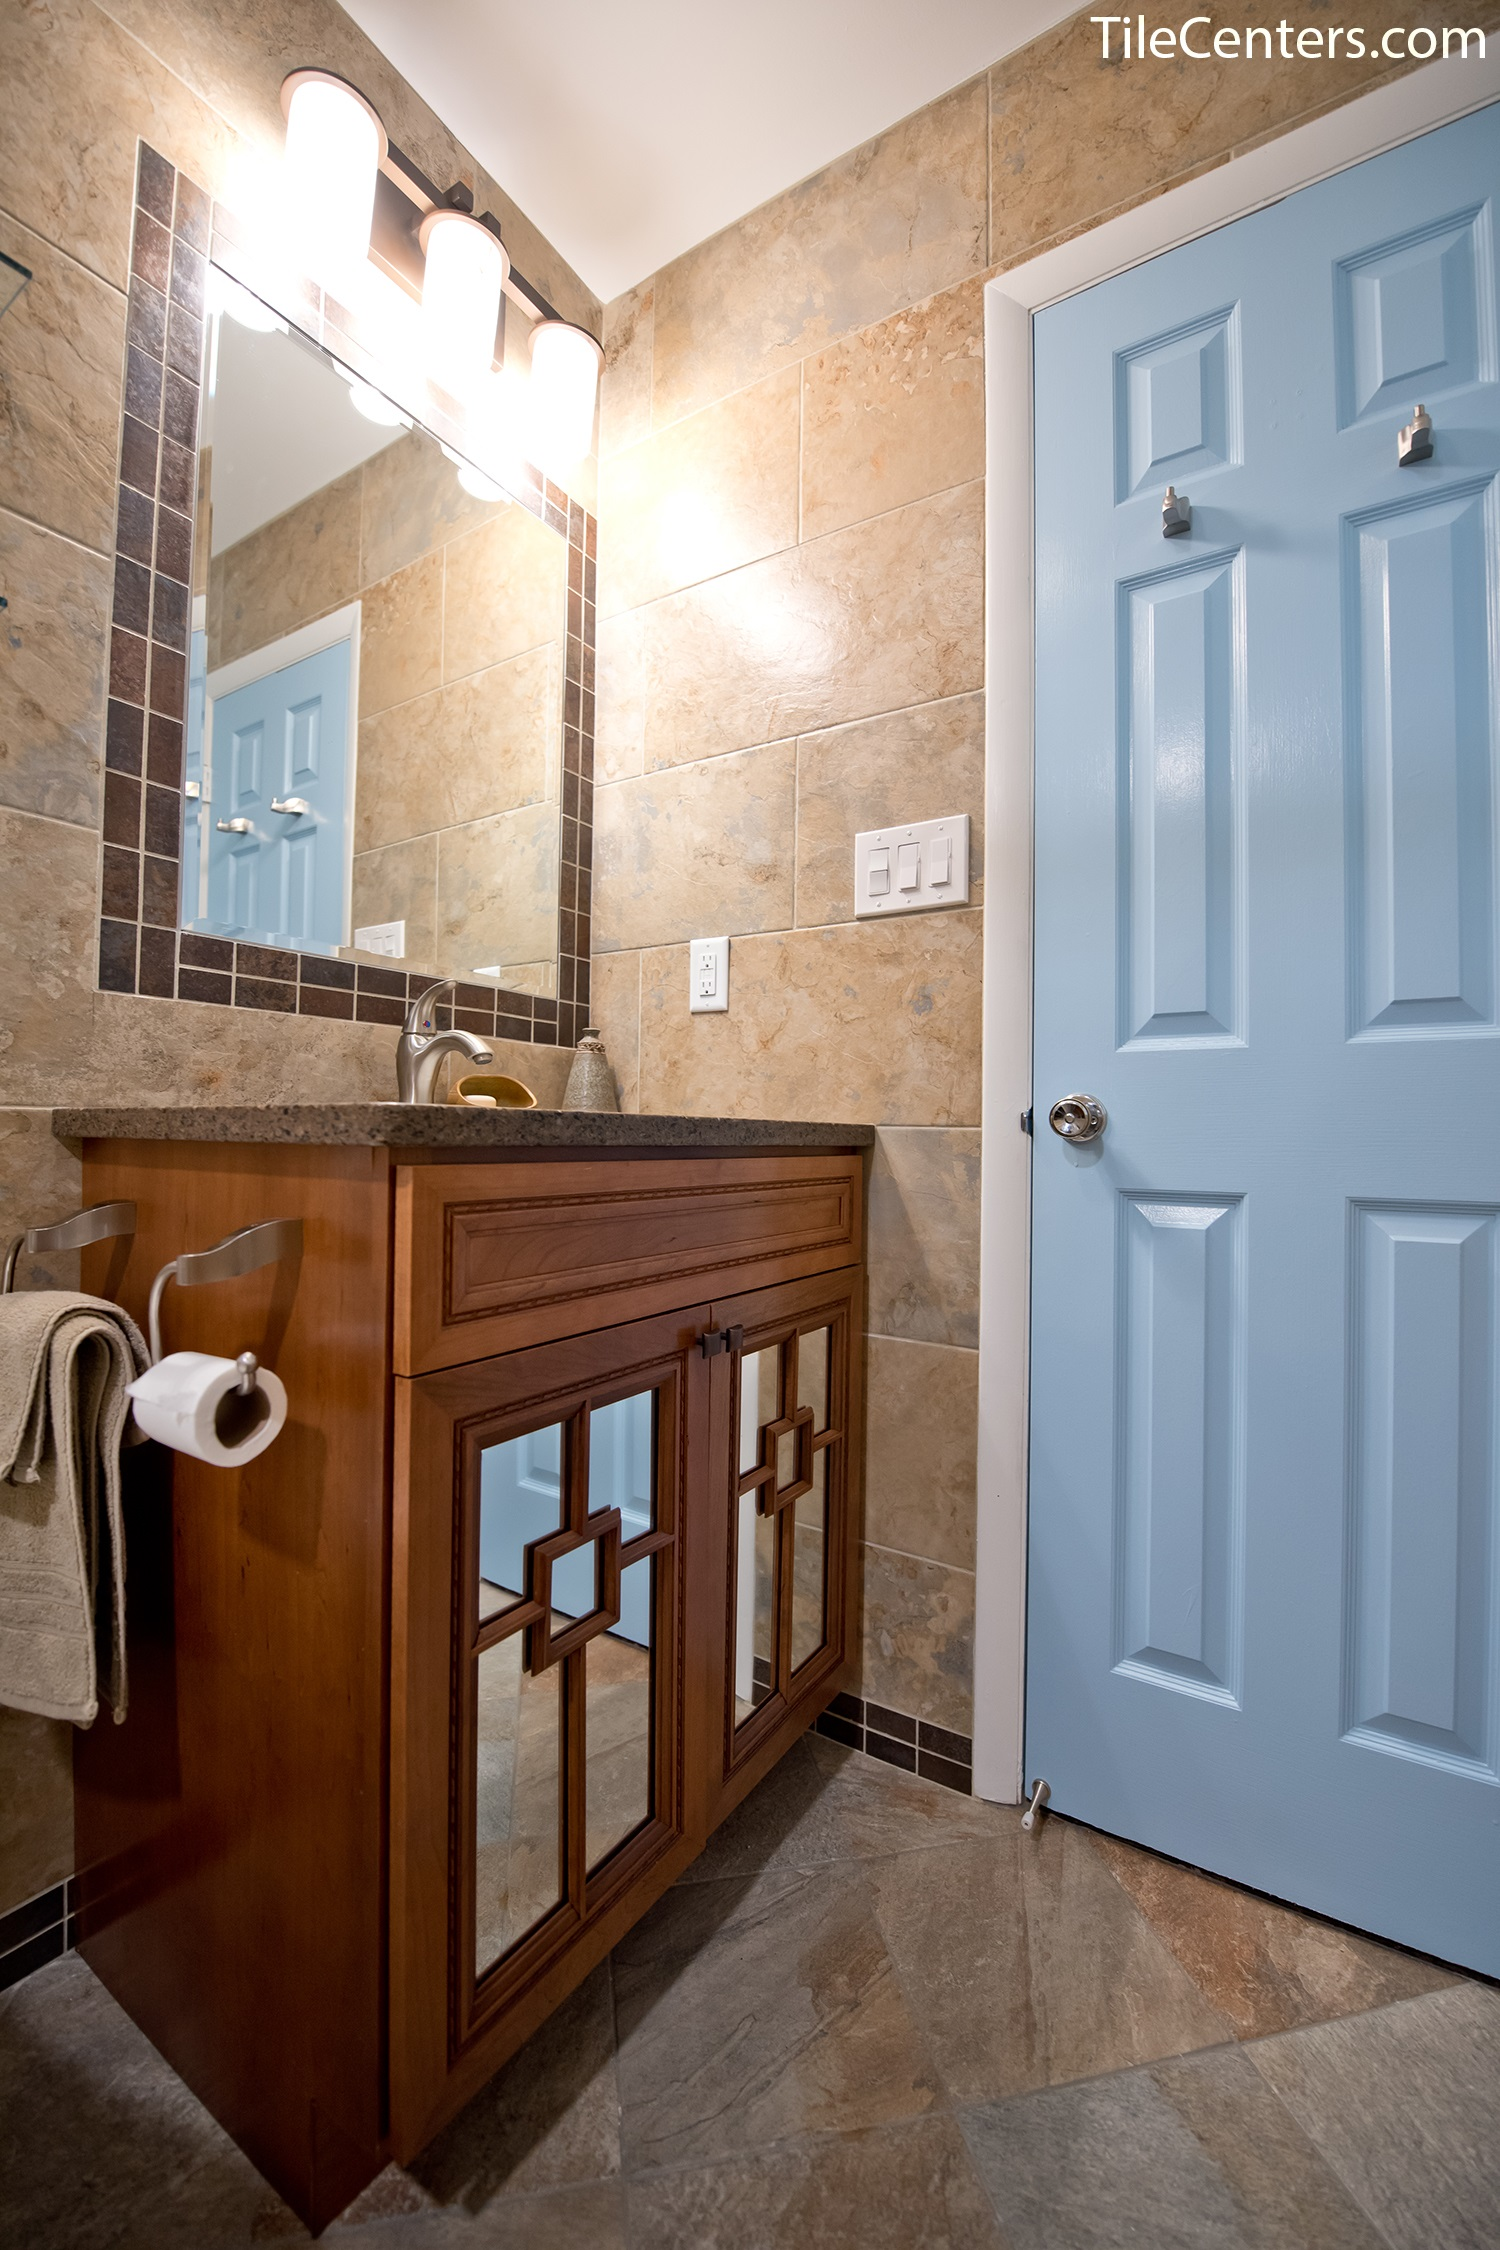 Bathroom remodel farcroft terrace gaithersburg md 20879 - Bathroom remodeling gaithersburg md ...